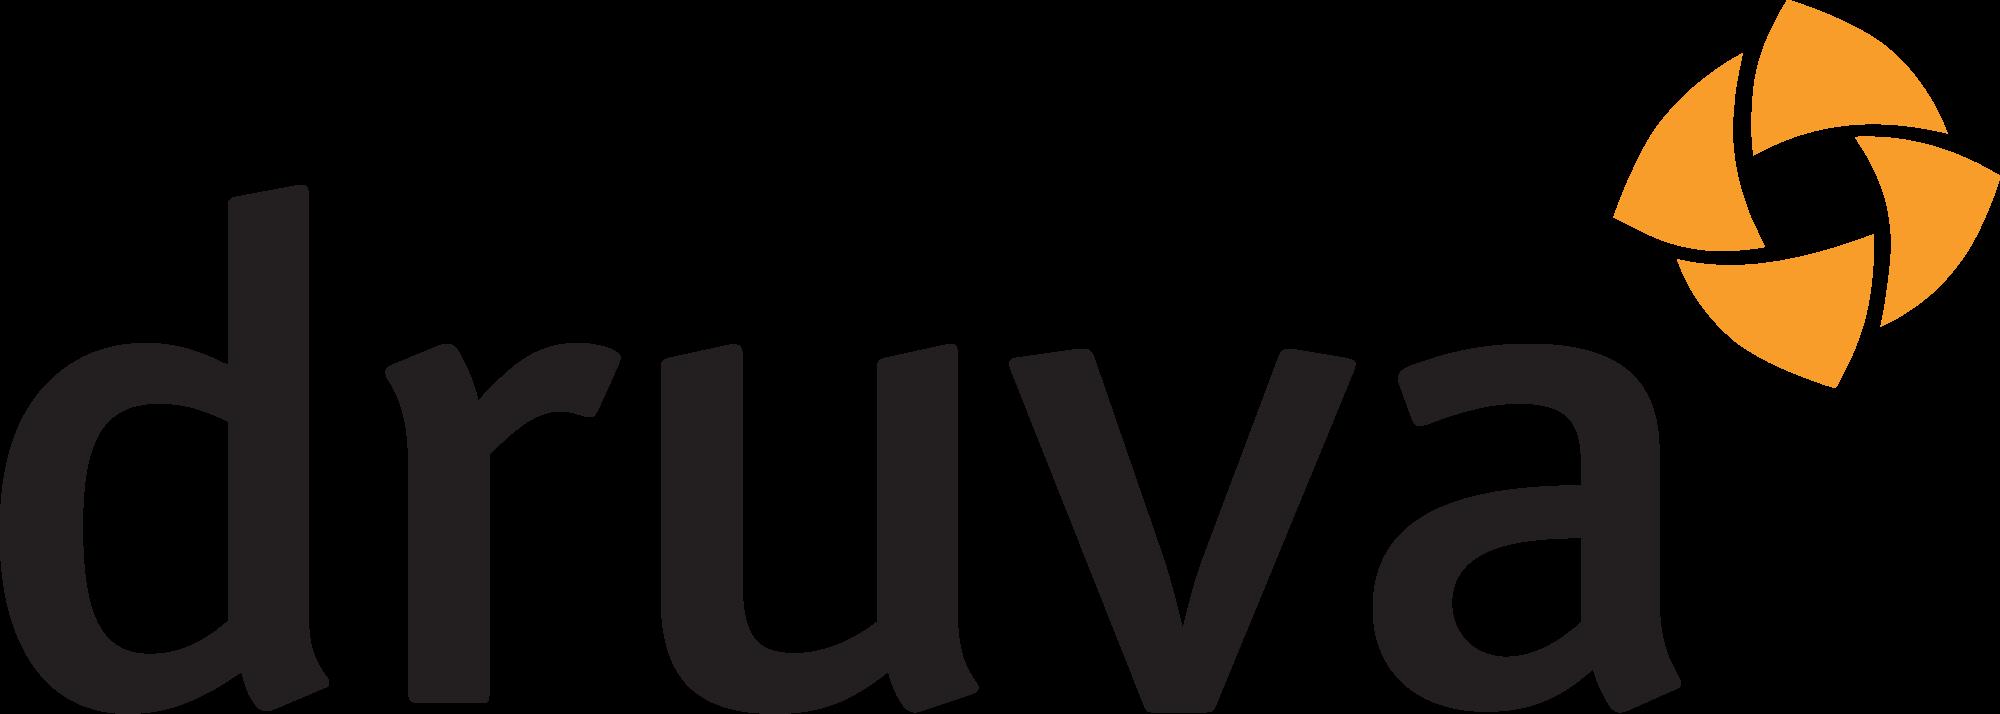 druva-logo-black-notm-notag